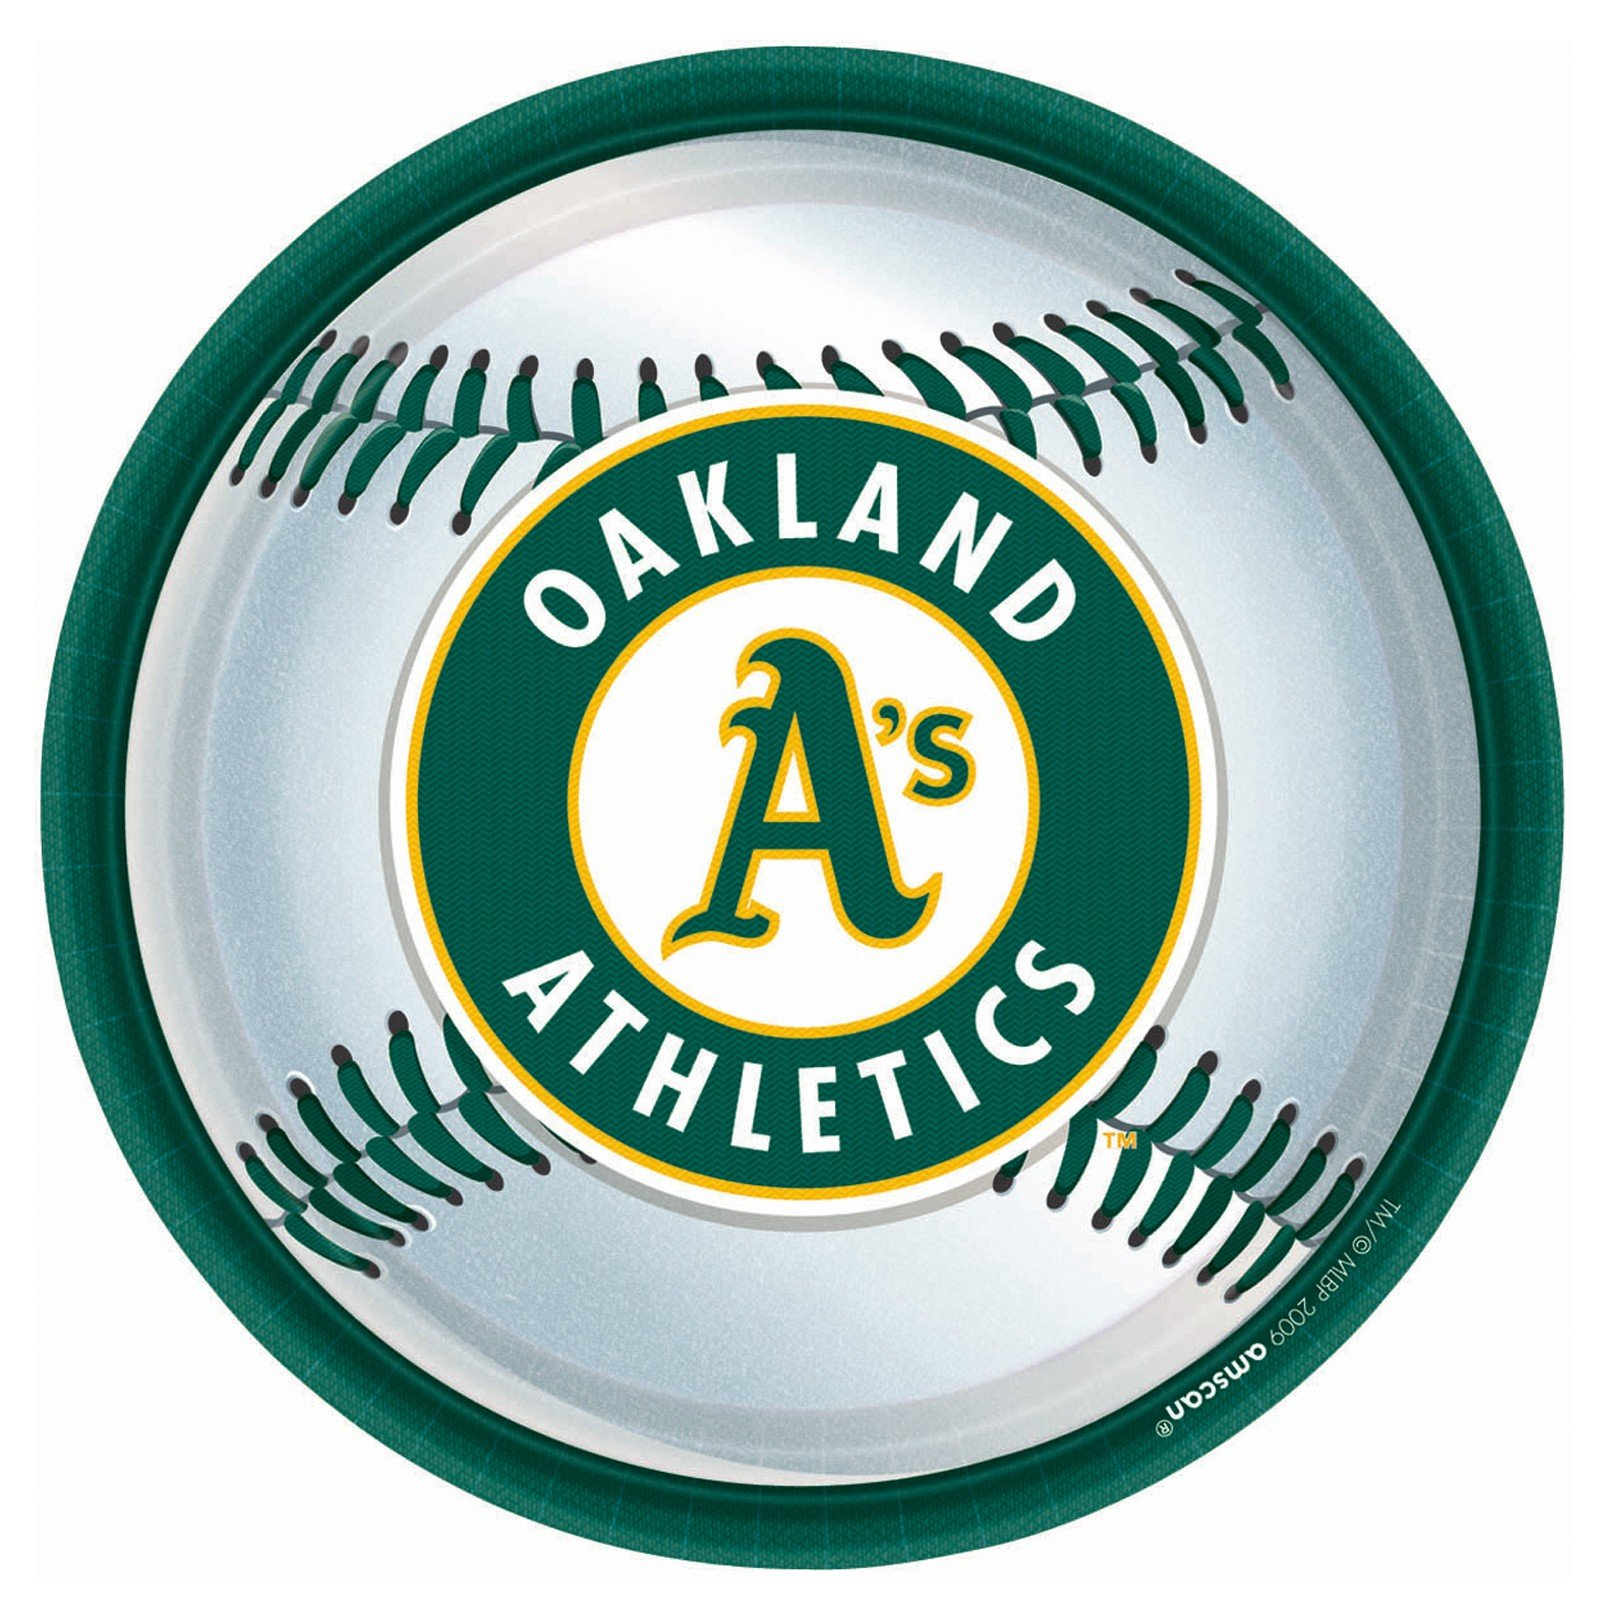 OAKLAND ATHLETICS mlb baseball 91 wallpaper background 1600x1600